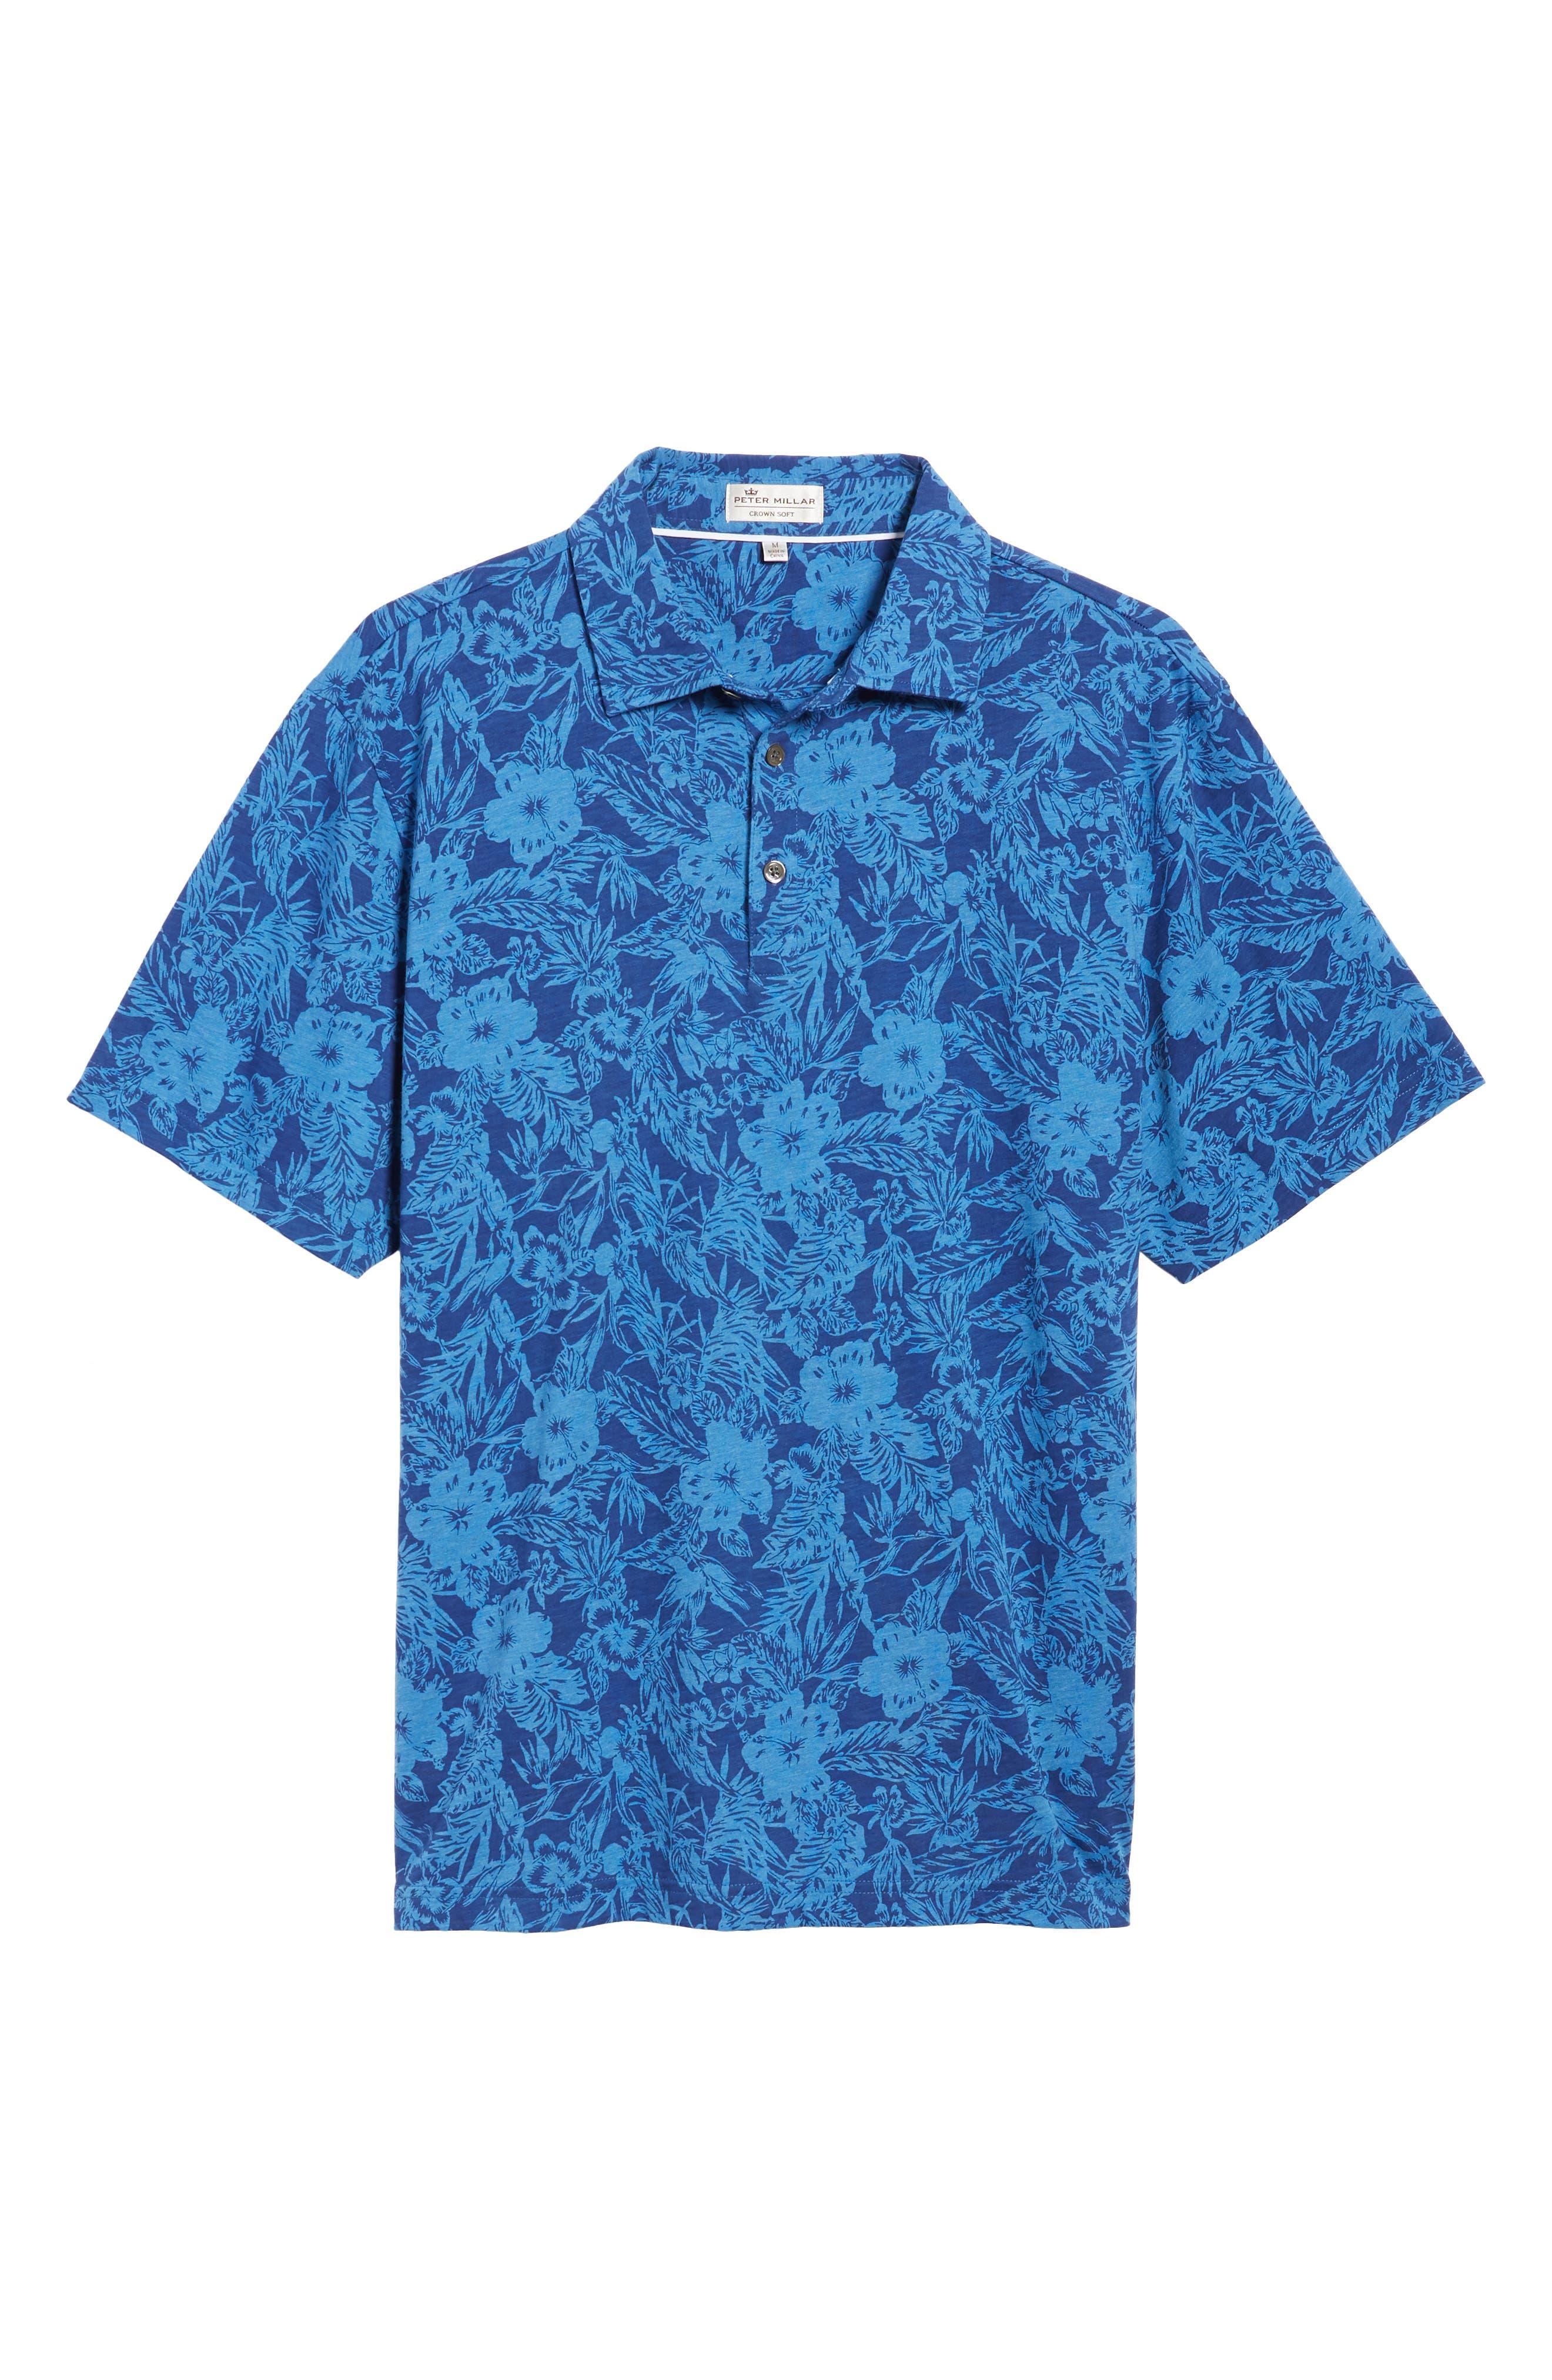 Crown Floral Cotton & Silk Polo Shirt,                             Alternate thumbnail 6, color,                             400